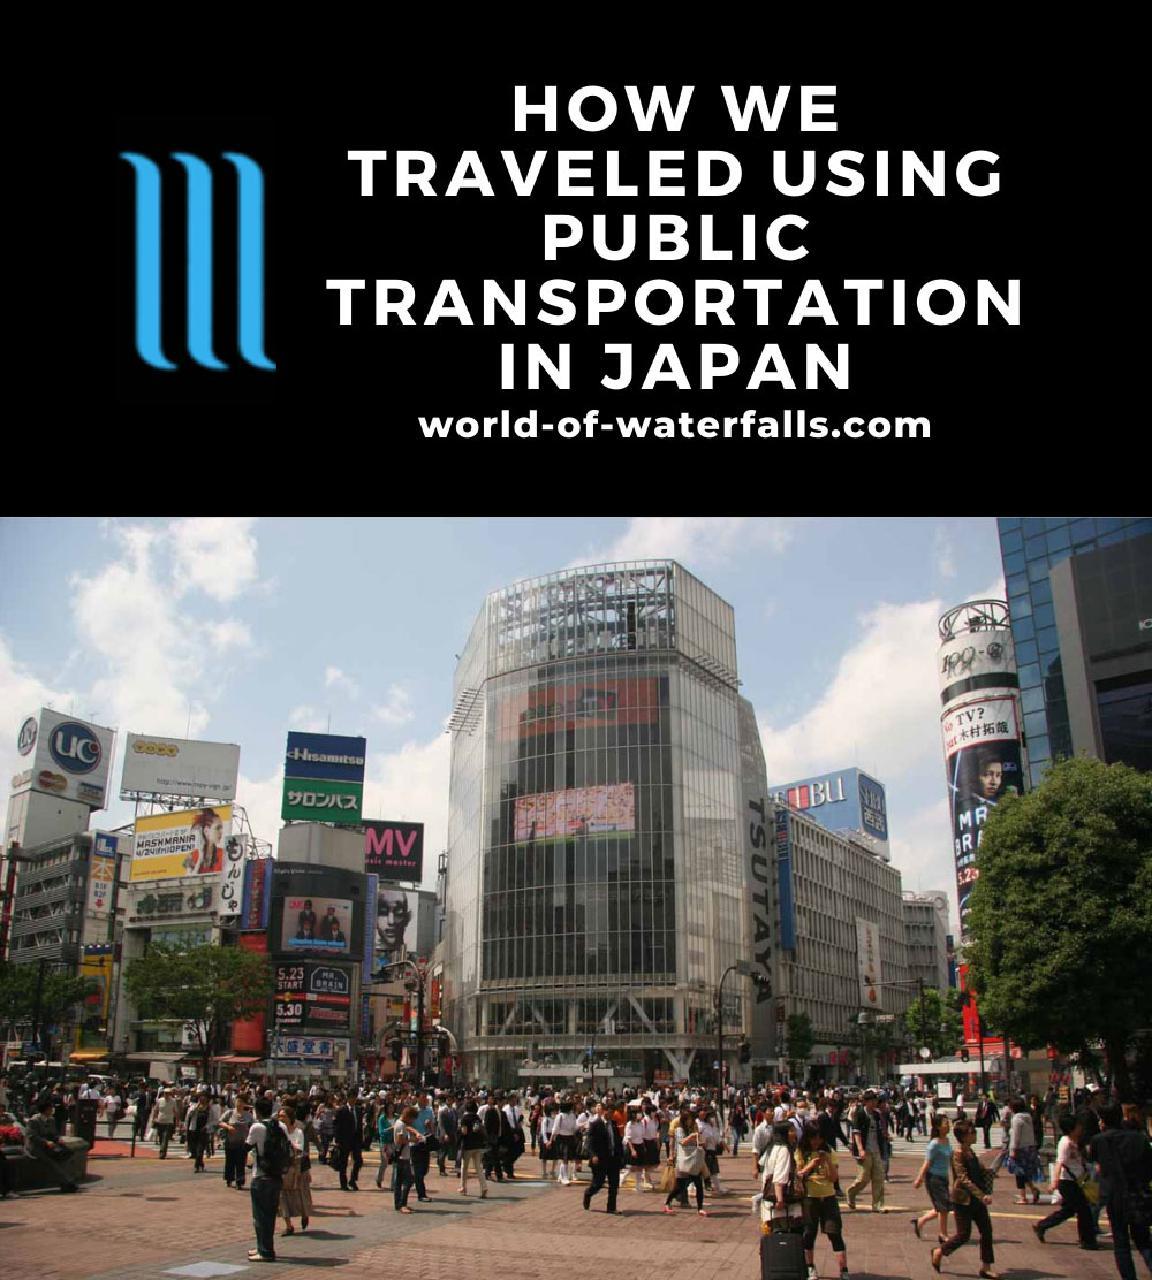 How We Traveled Using Public Transportation in Japan